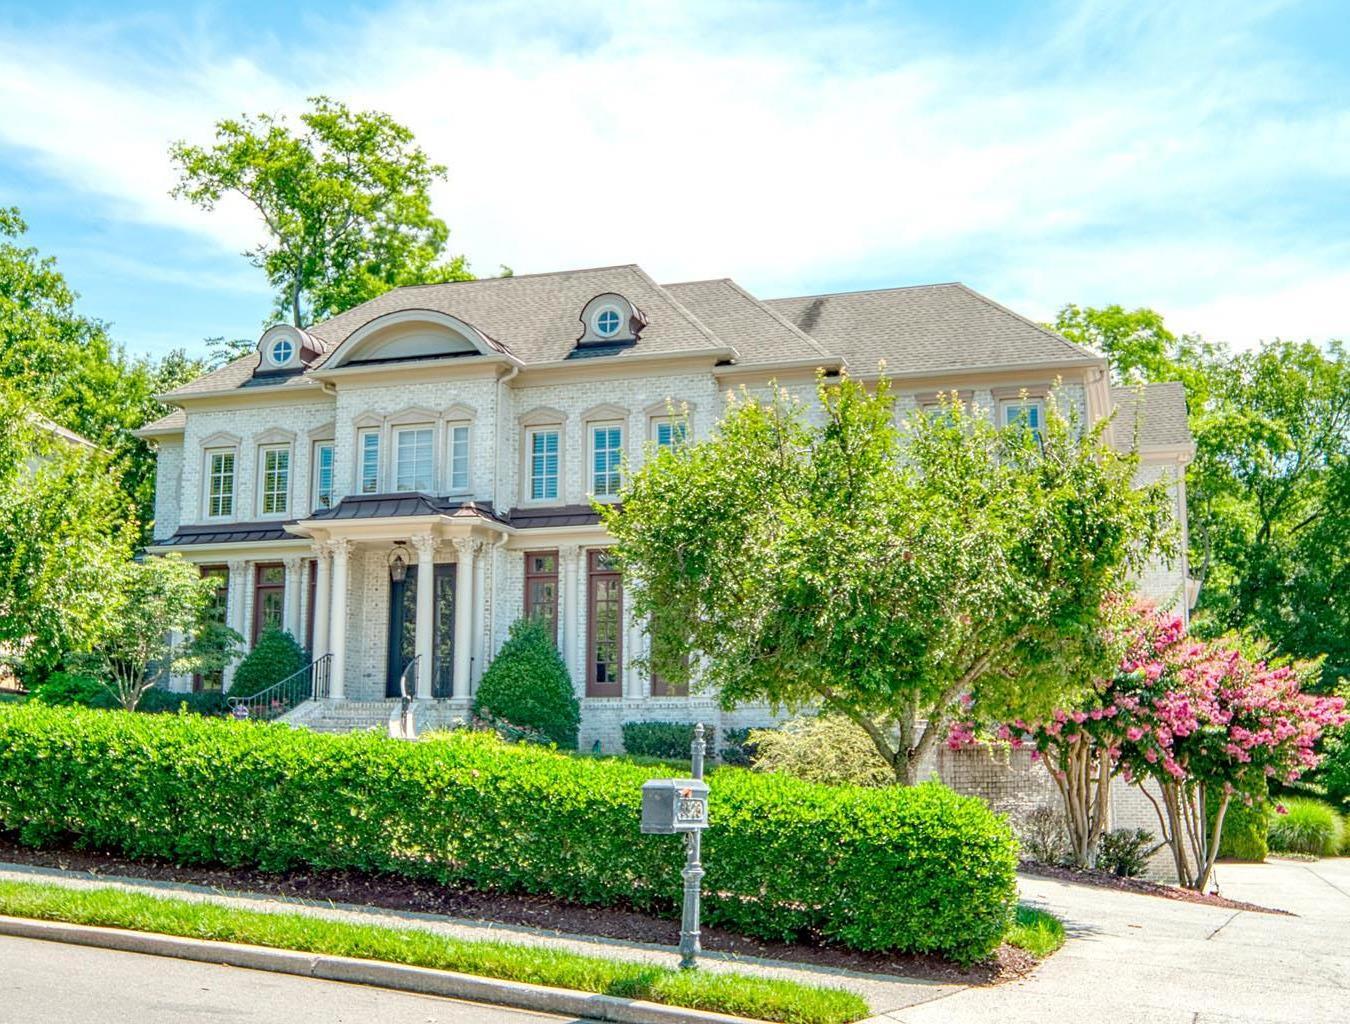 5528 Iron Gate Dr, Franklin, TN 37069 - Franklin, TN real estate listing